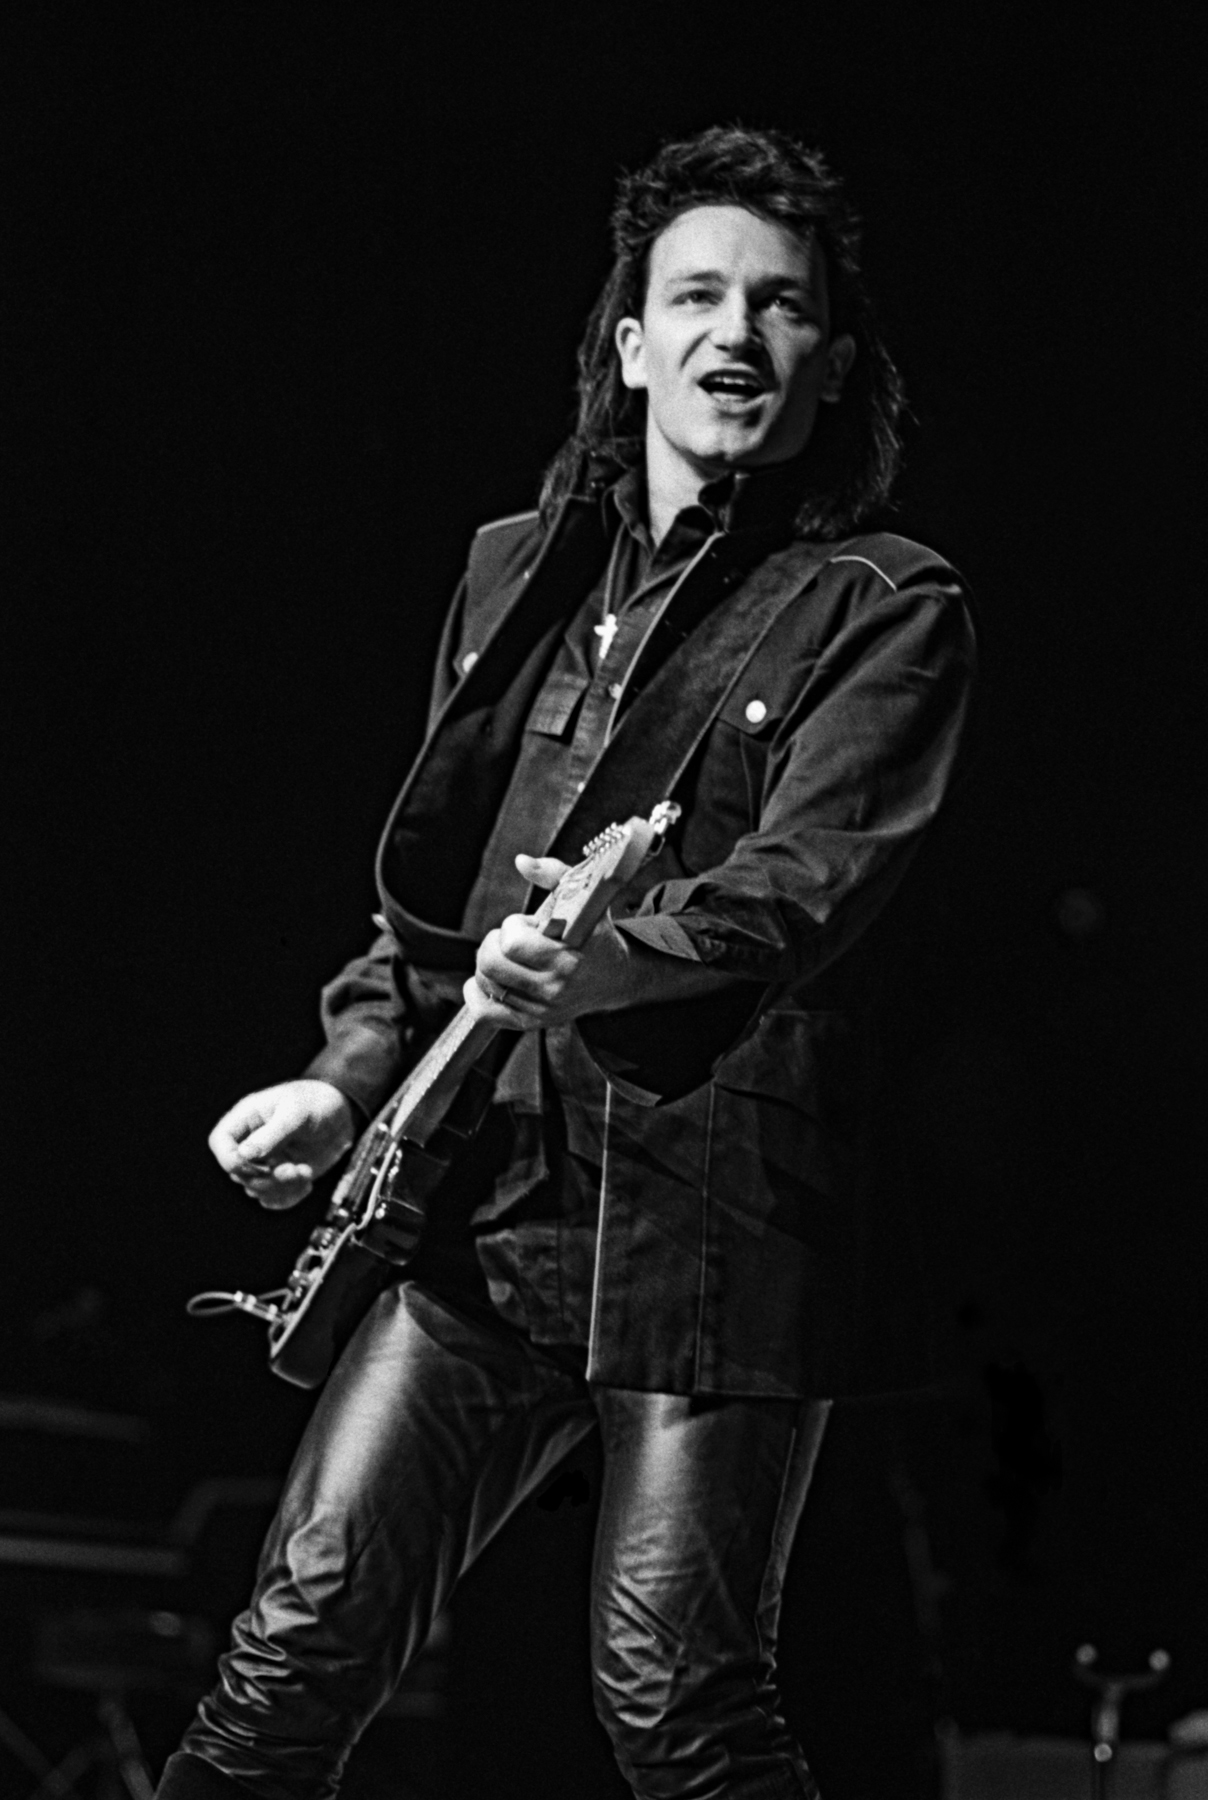 https://rockandrollphotogallery.com/wp-content/uploads/2014/06/u2-performing.jpg Bono 1983